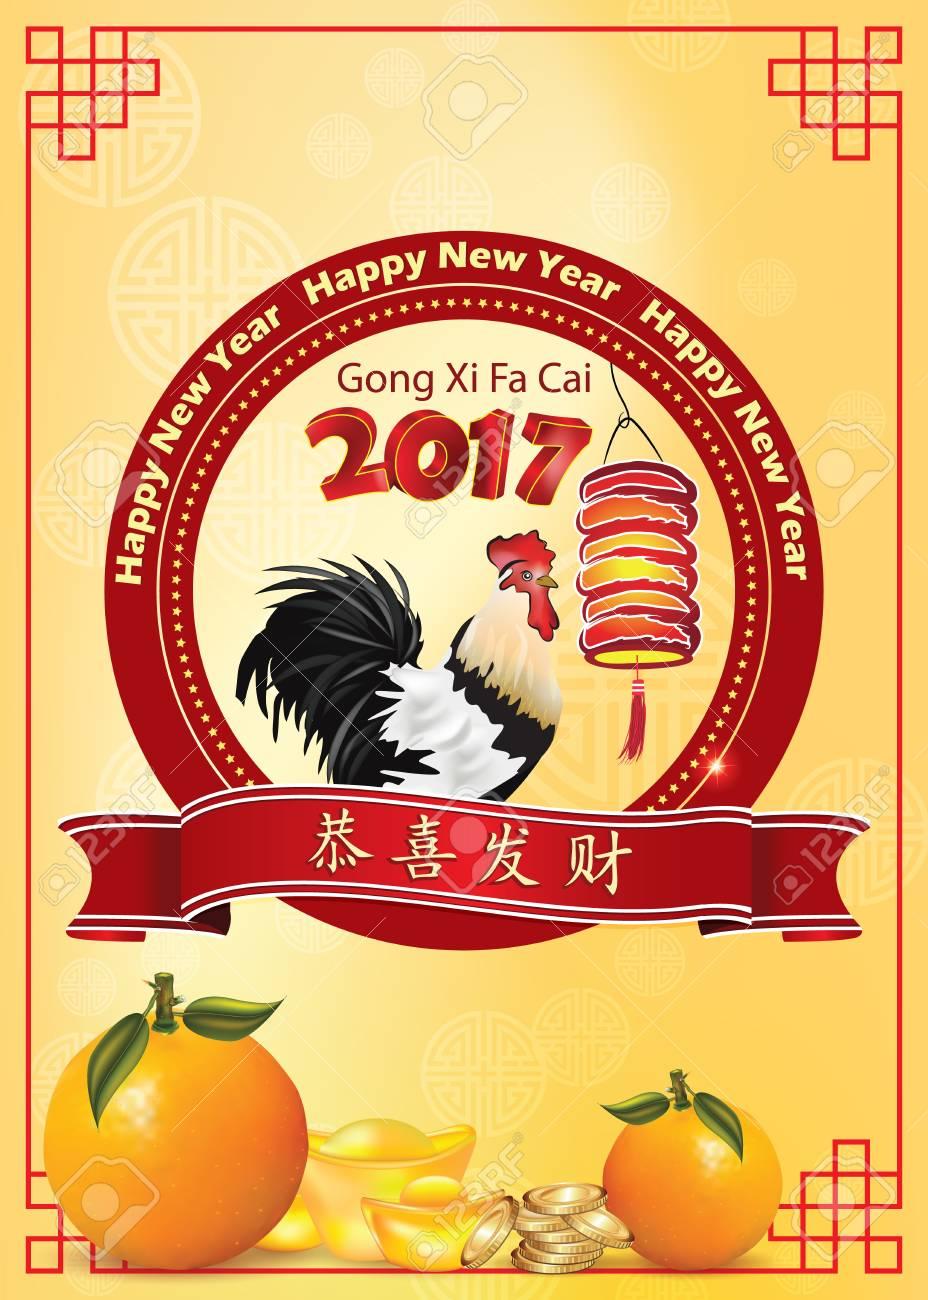 Chinese New Year 2017, Jahr Des Hahns - Grußkarte. Chinese Text ...